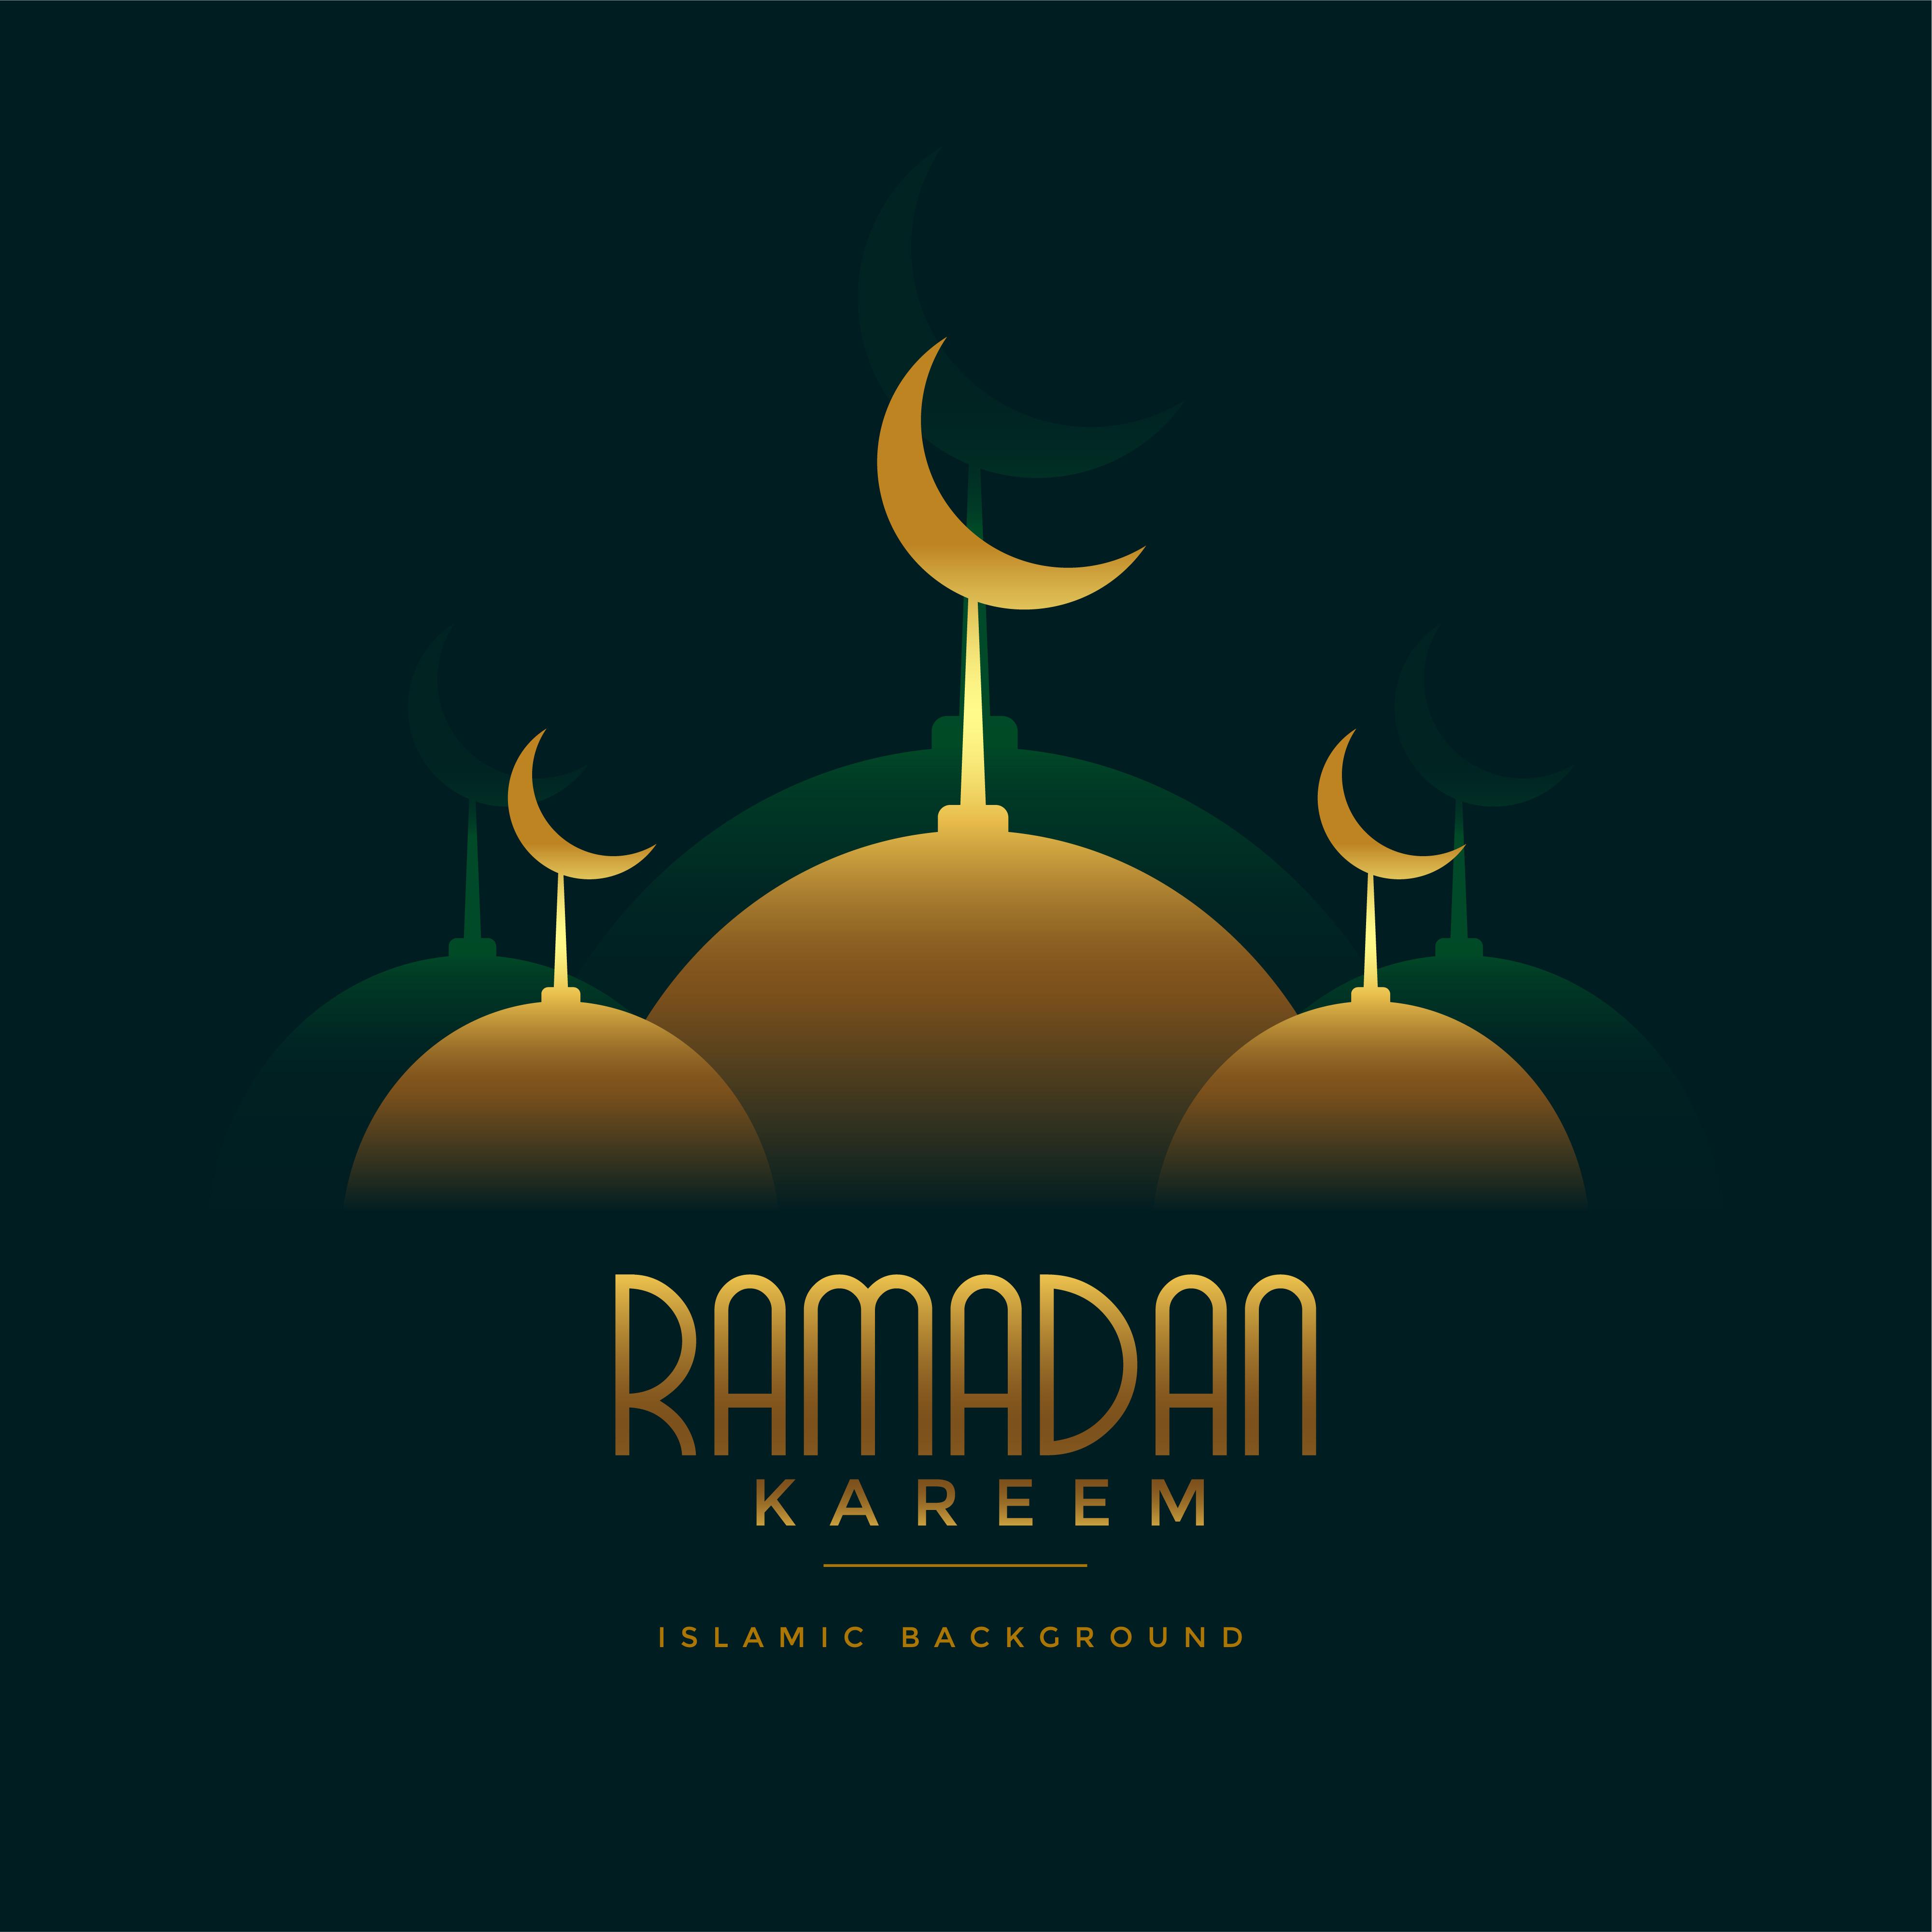 Islamic greeting free vector art 10525 free downloads m4hsunfo